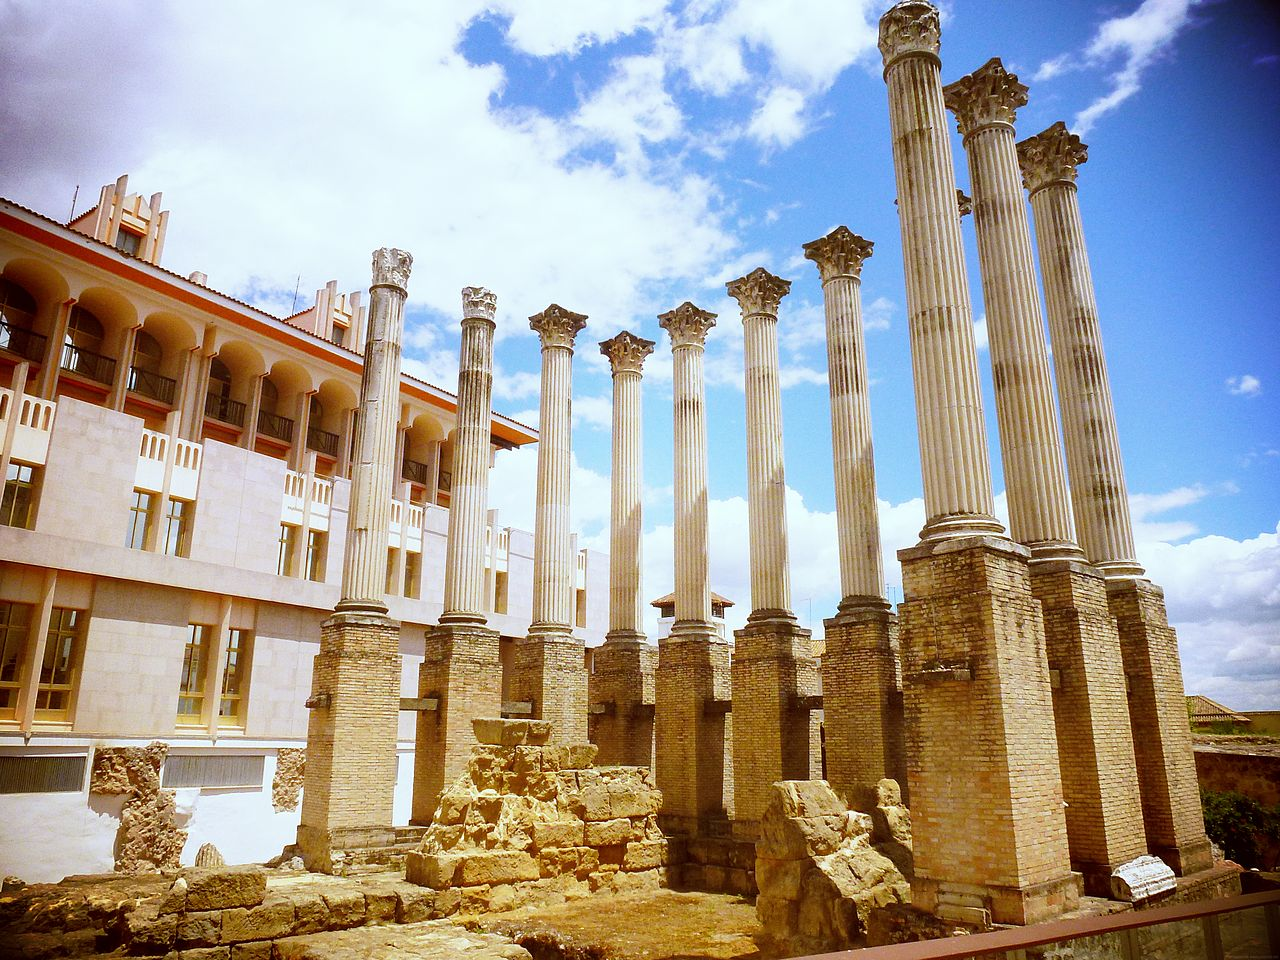 templo romano de cordoba 2